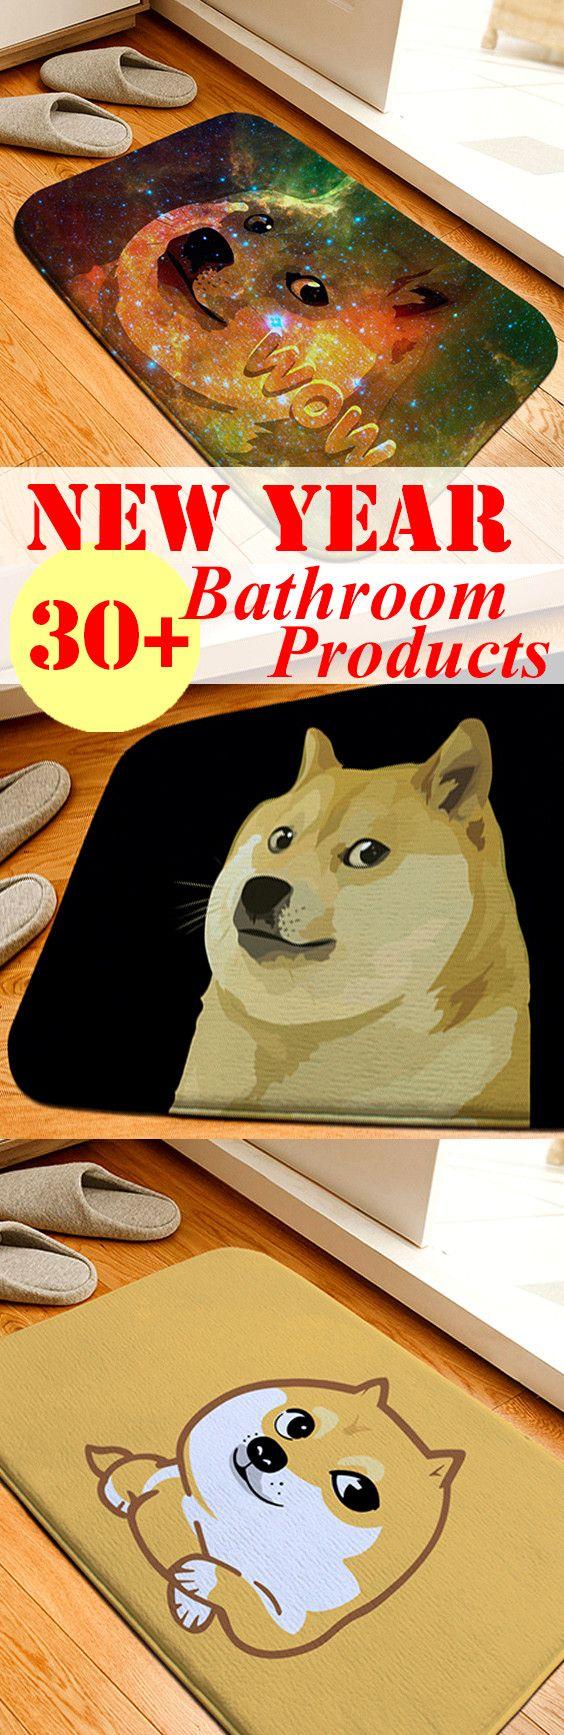 New Year 30+ Bathroom Products